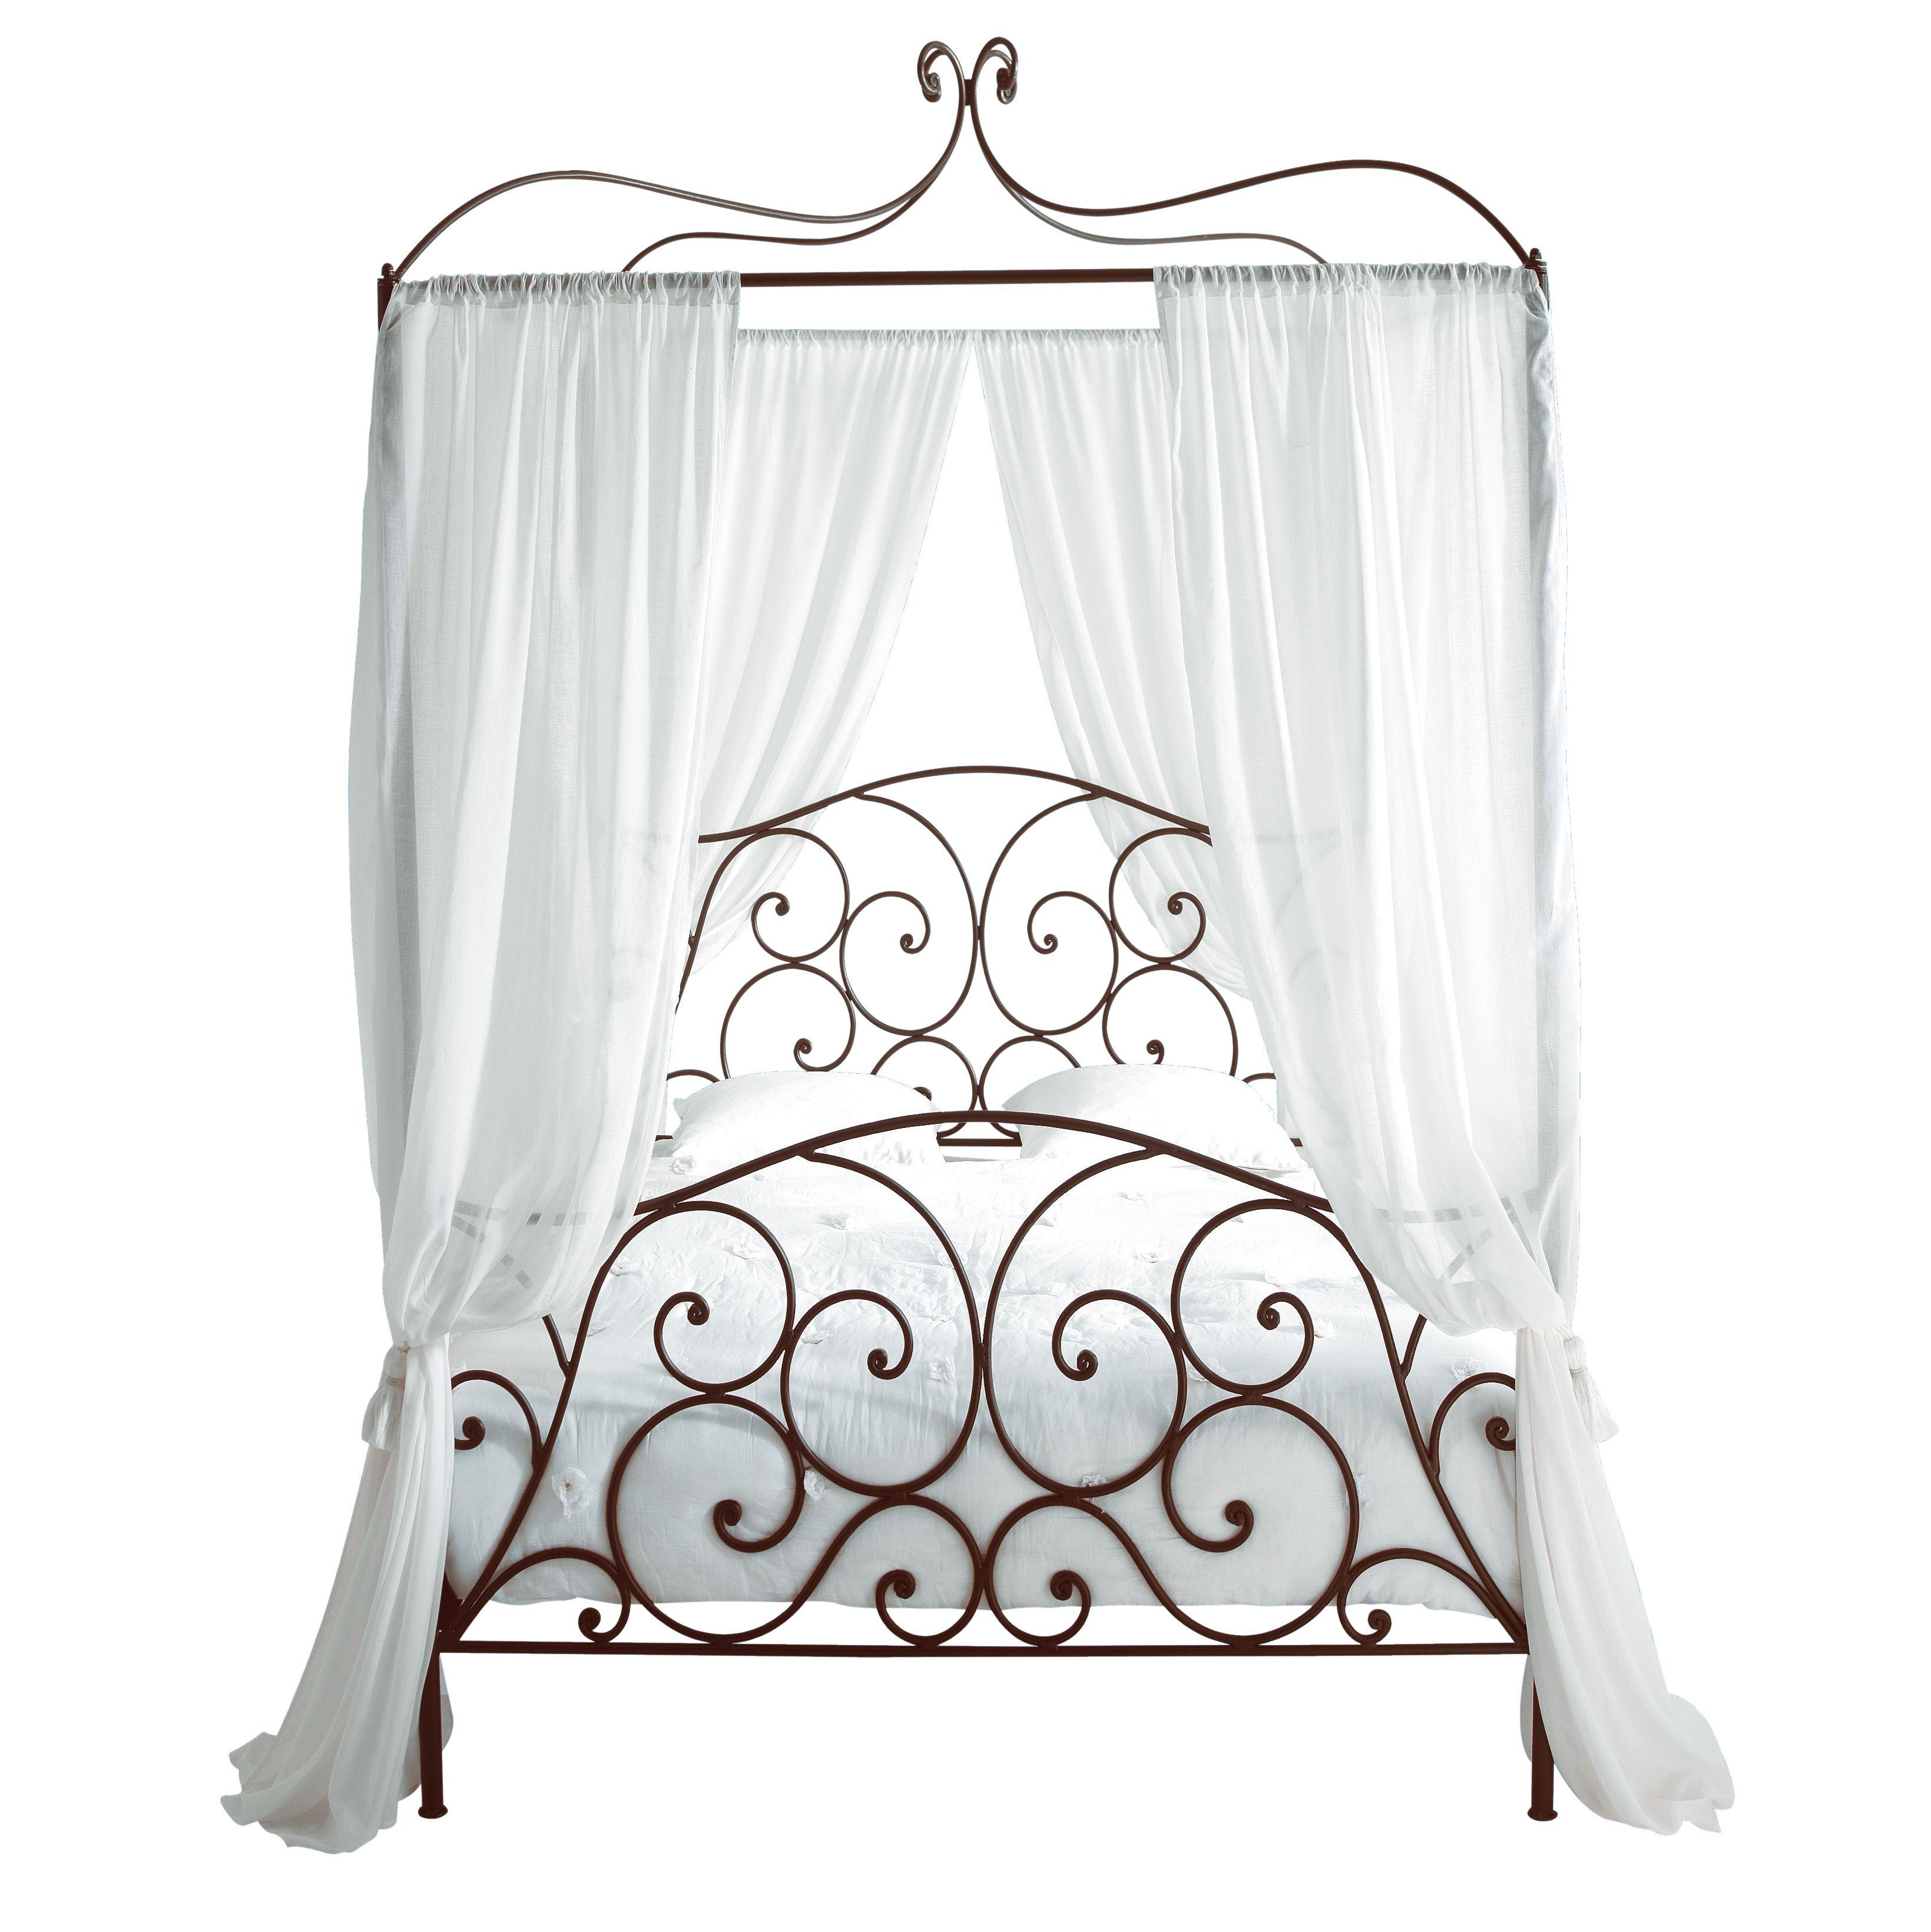 Lit à Baldaquin X En Métal Marron Metal Double Bed Double - Lit baldaquin 140